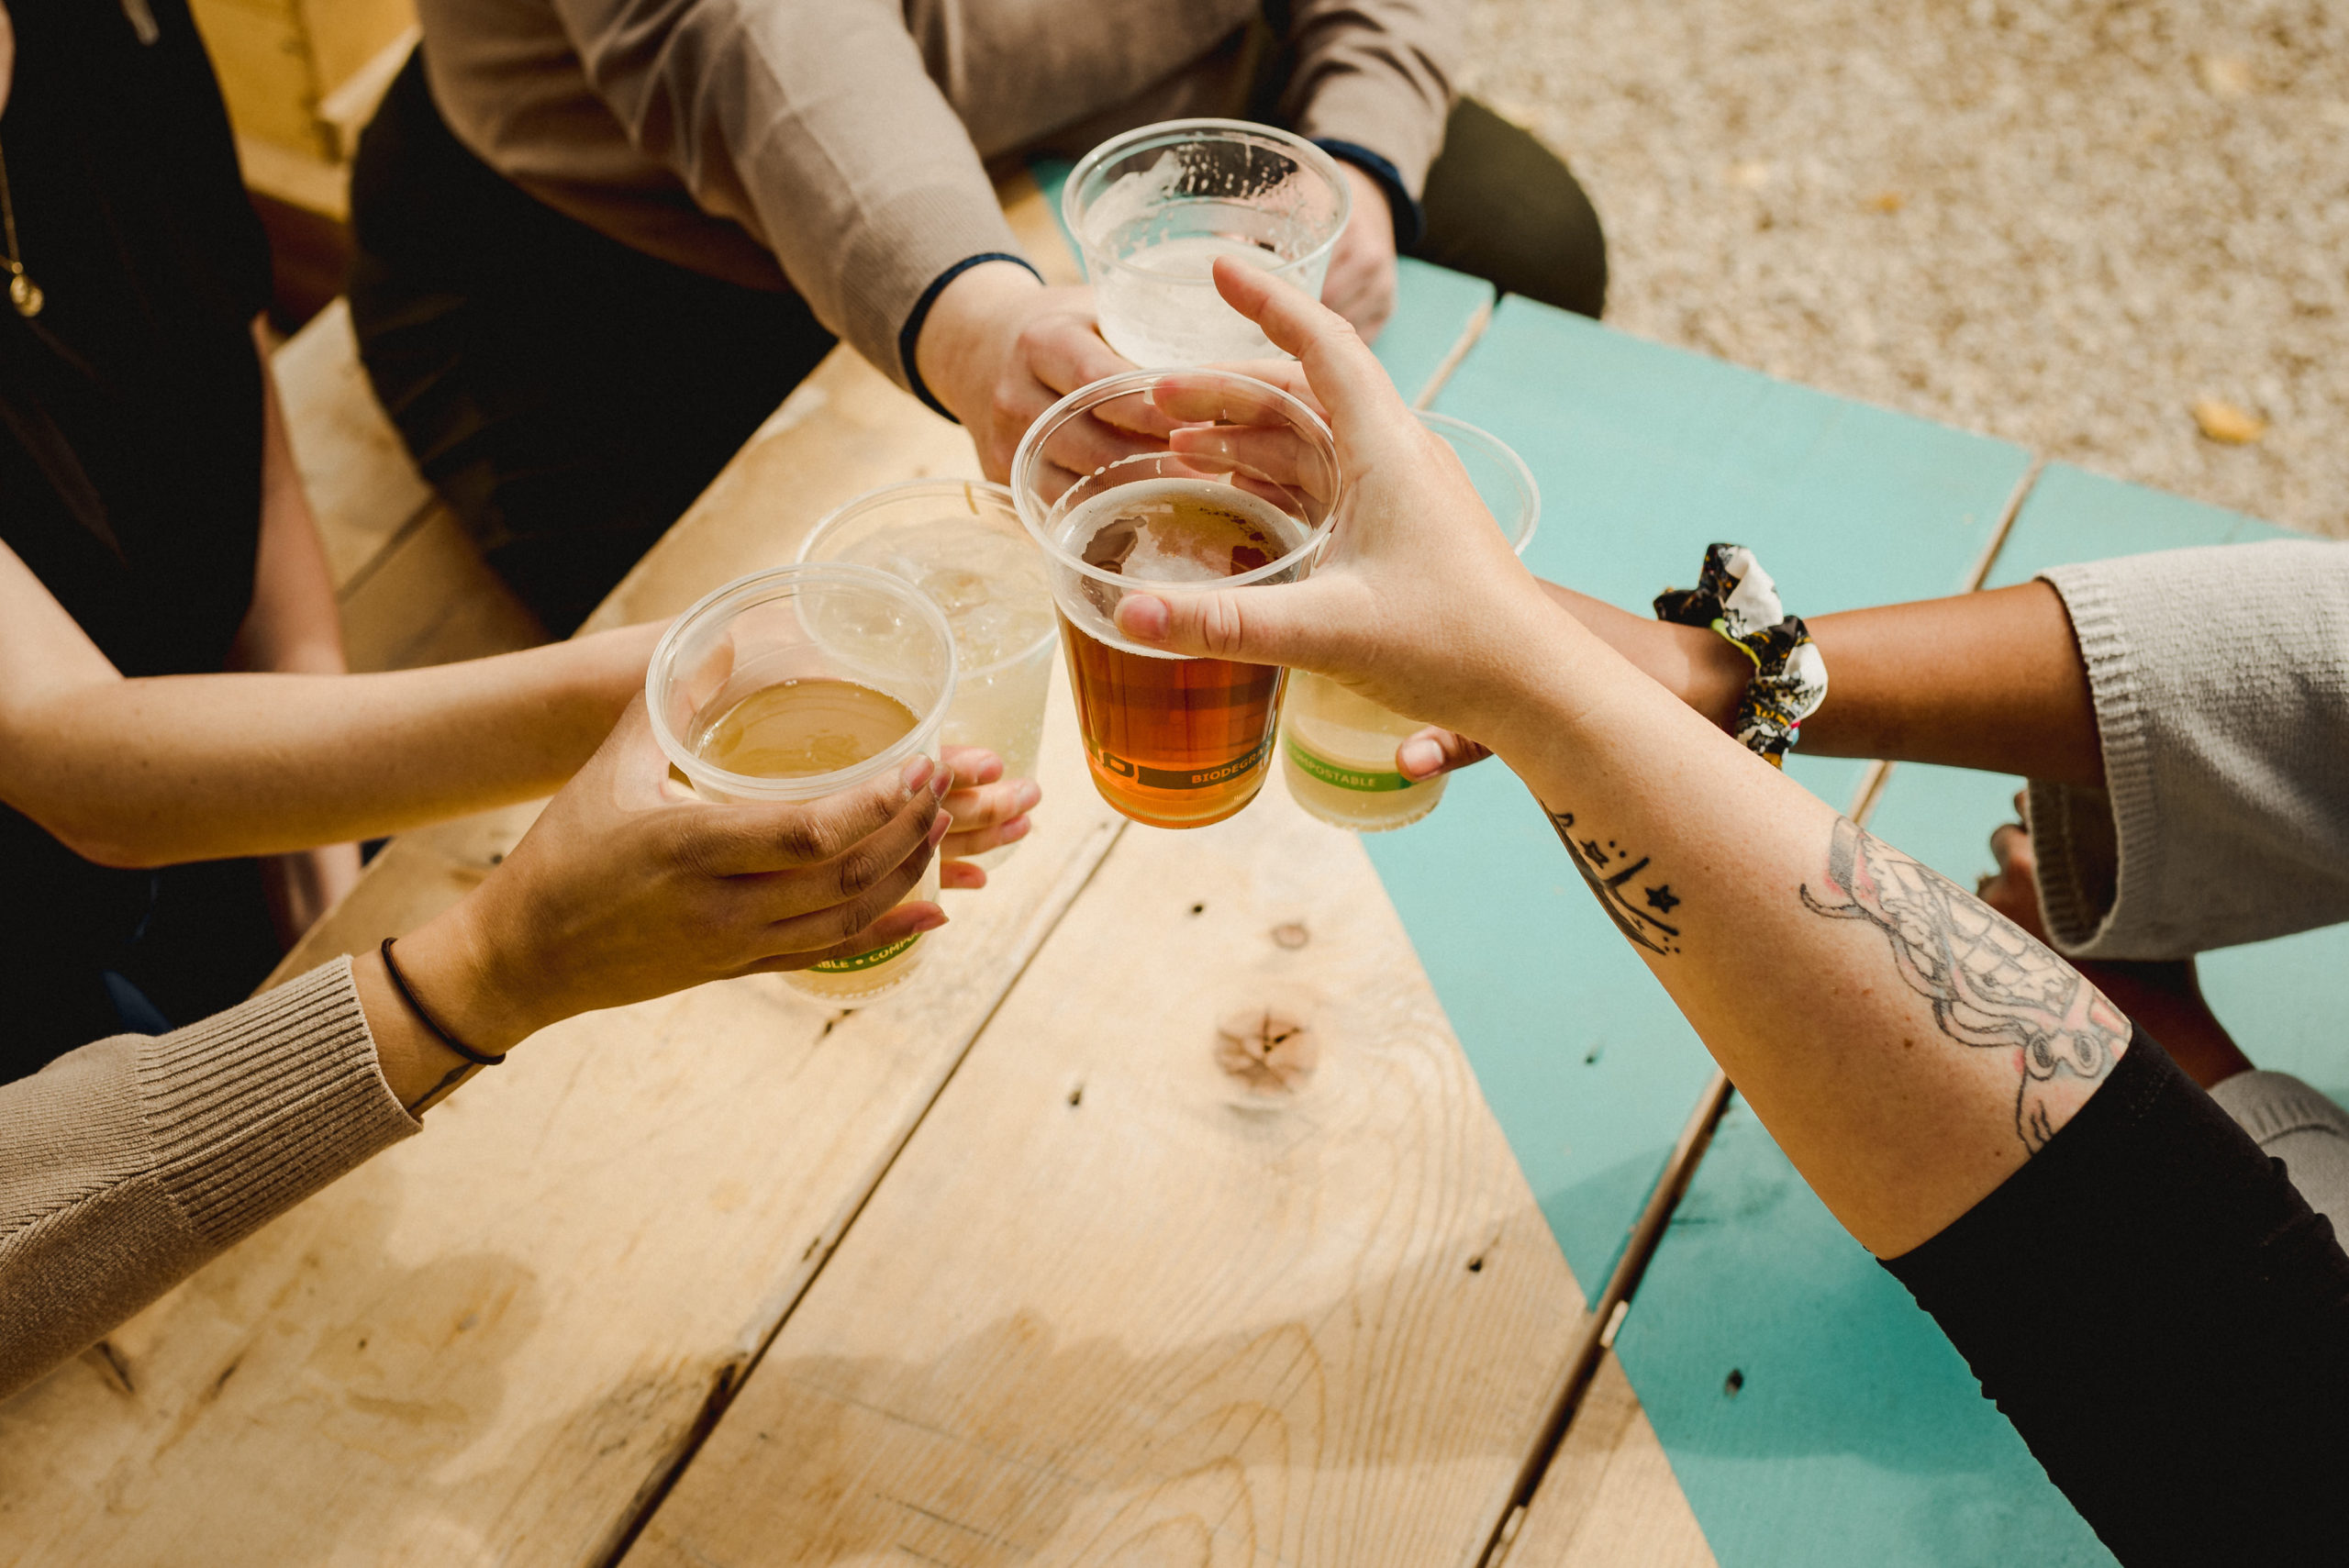 It's patio season! Hot tips for sunny sips